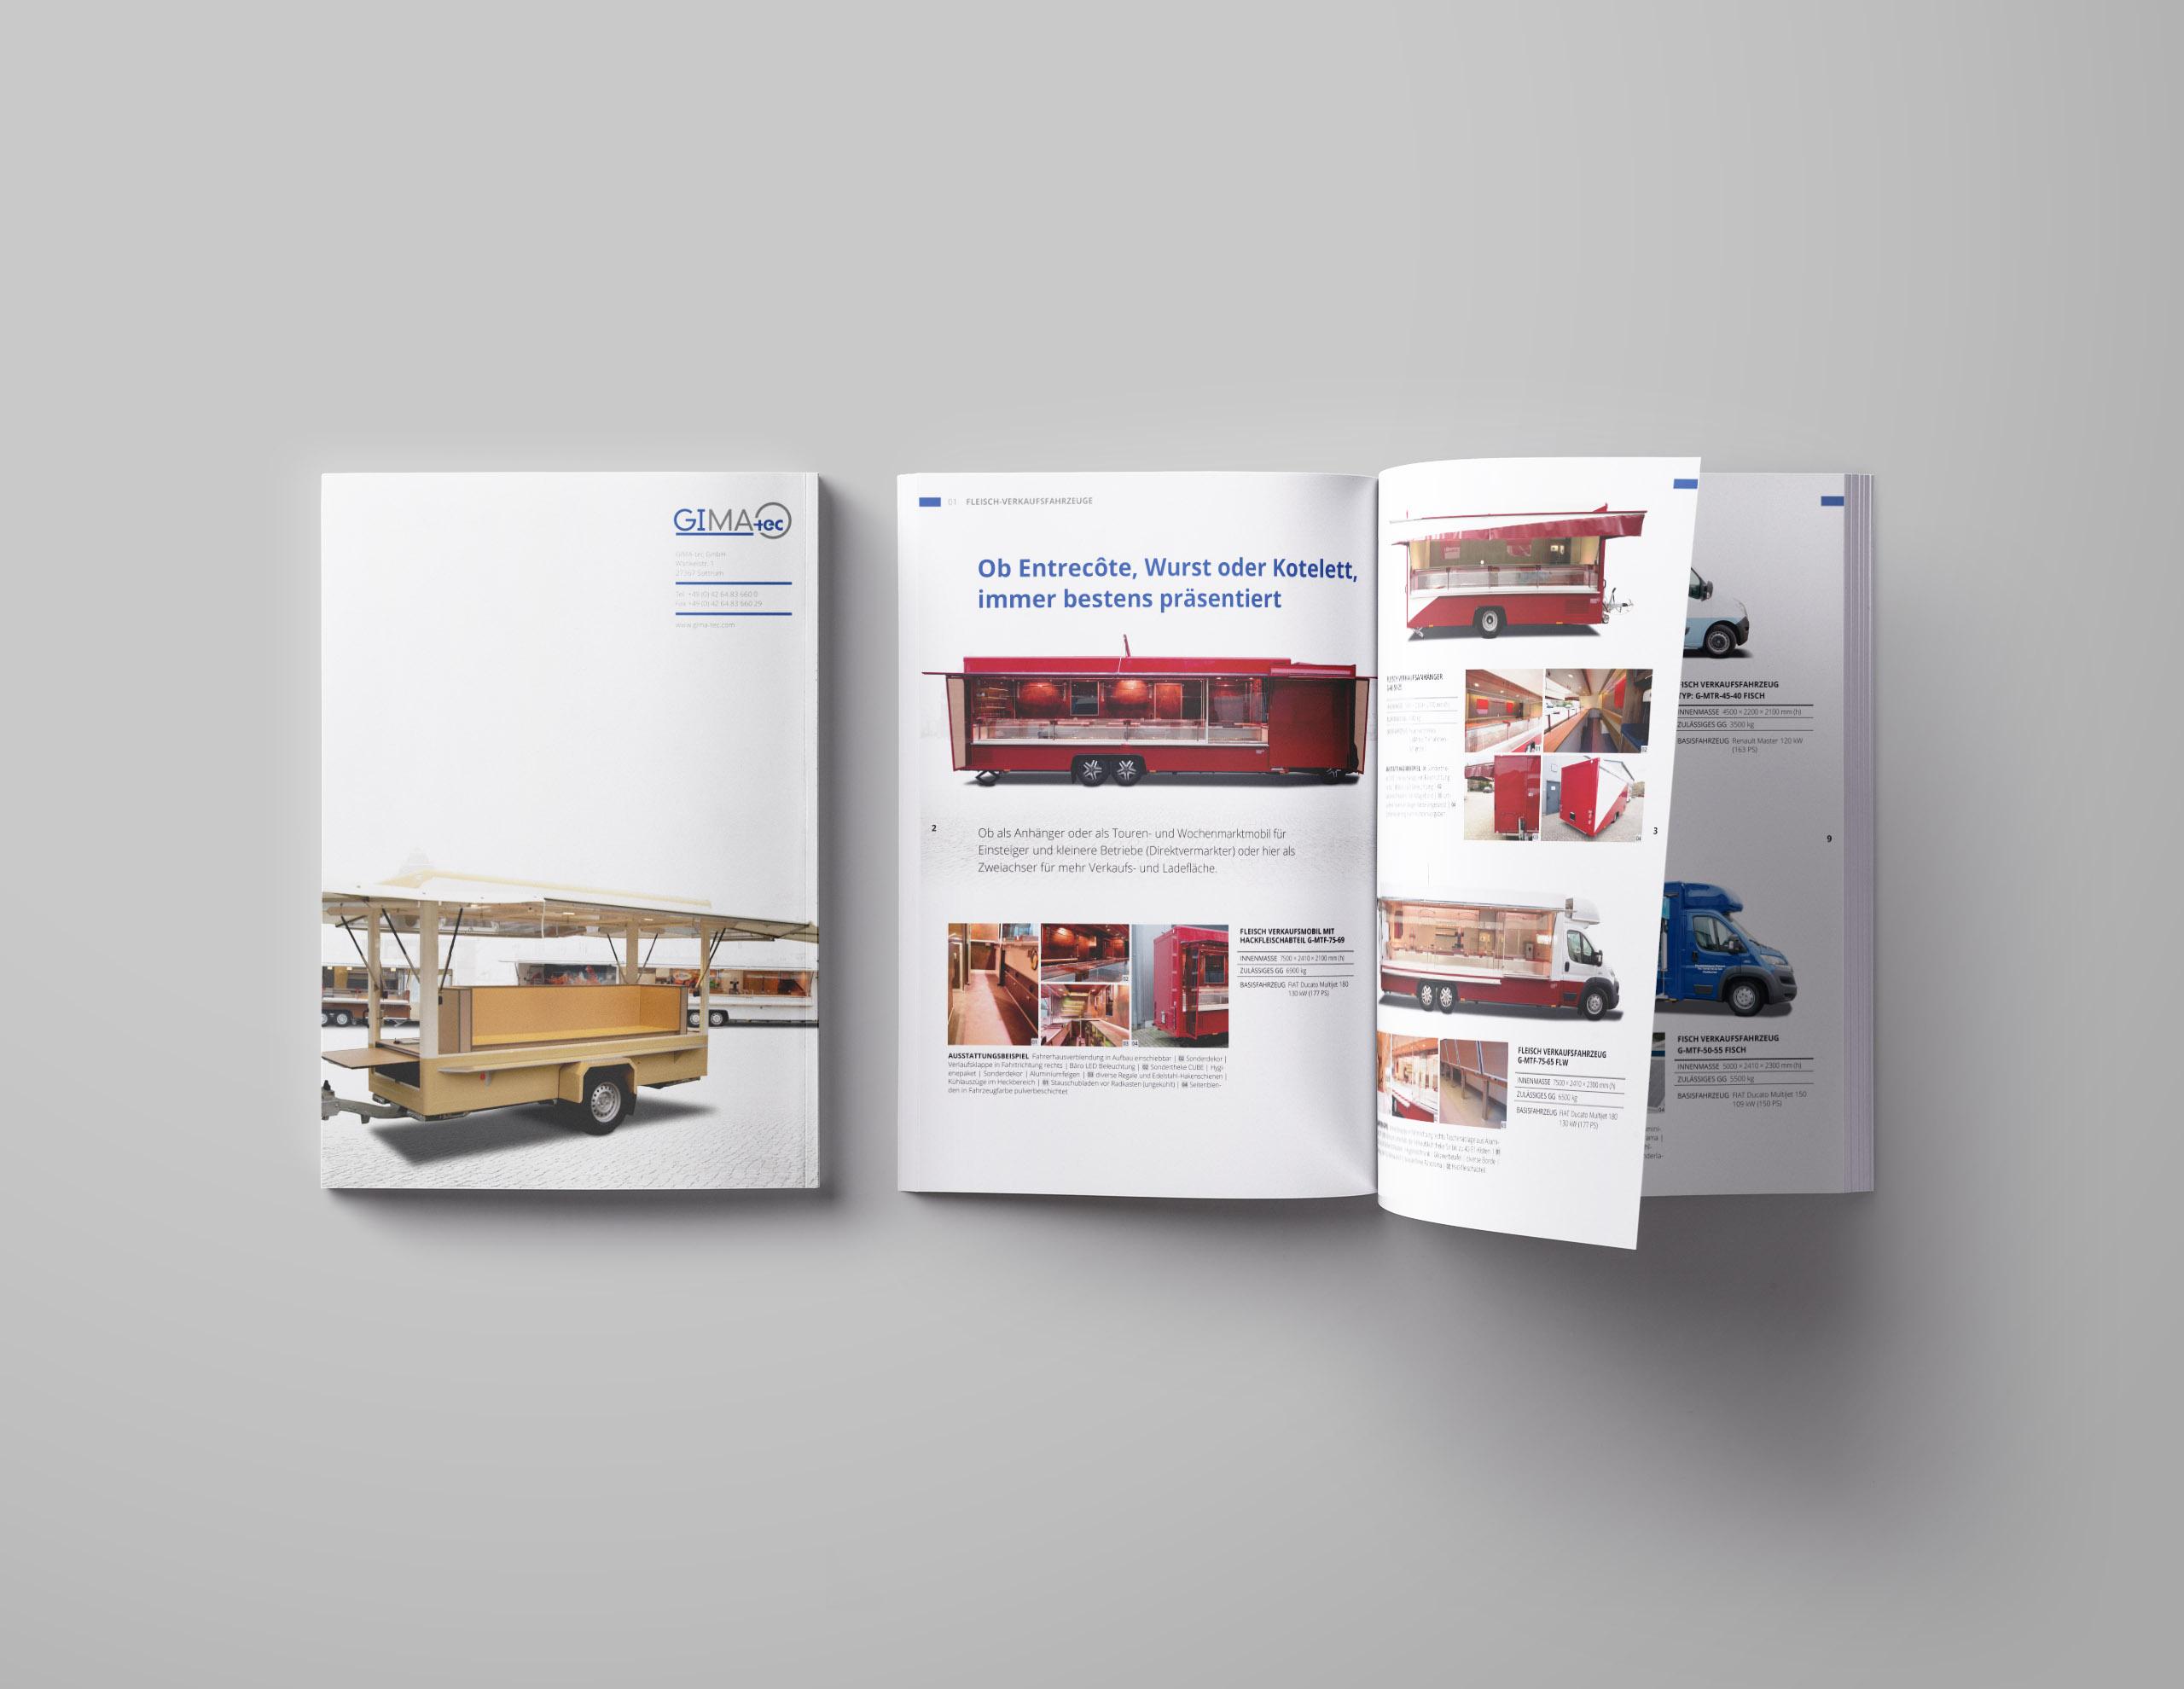 191125_GIMA-tec_Katalog_Magazine-Mockup-Presentation-vol9